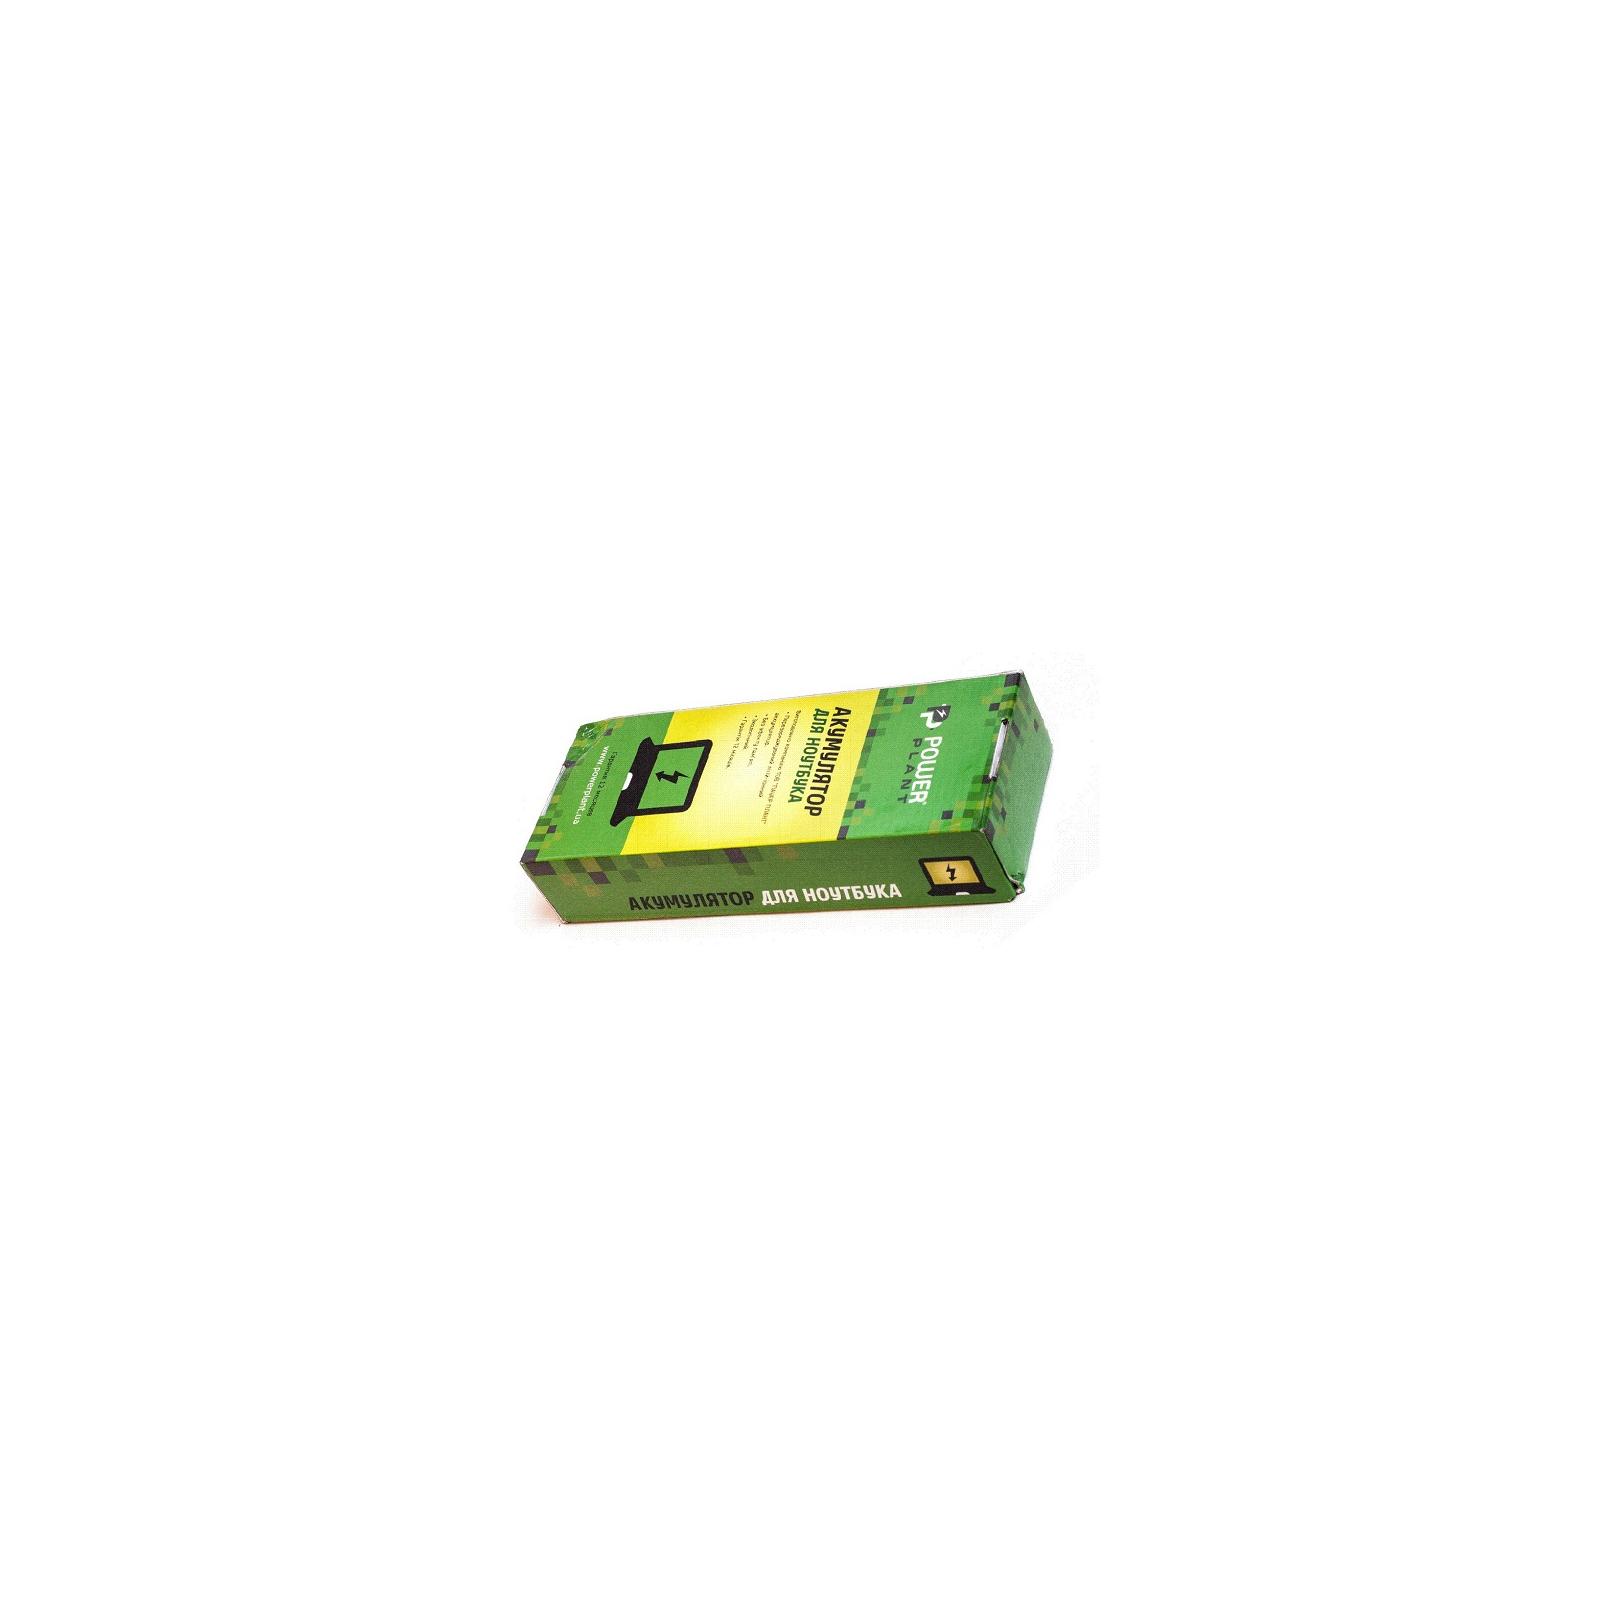 Аккумулятор для ноутбука SONY VAIO VPC-EA1 (VGP-BPS22) 11,1V 5200mAh PowerPlant (NB00000036) изображение 3